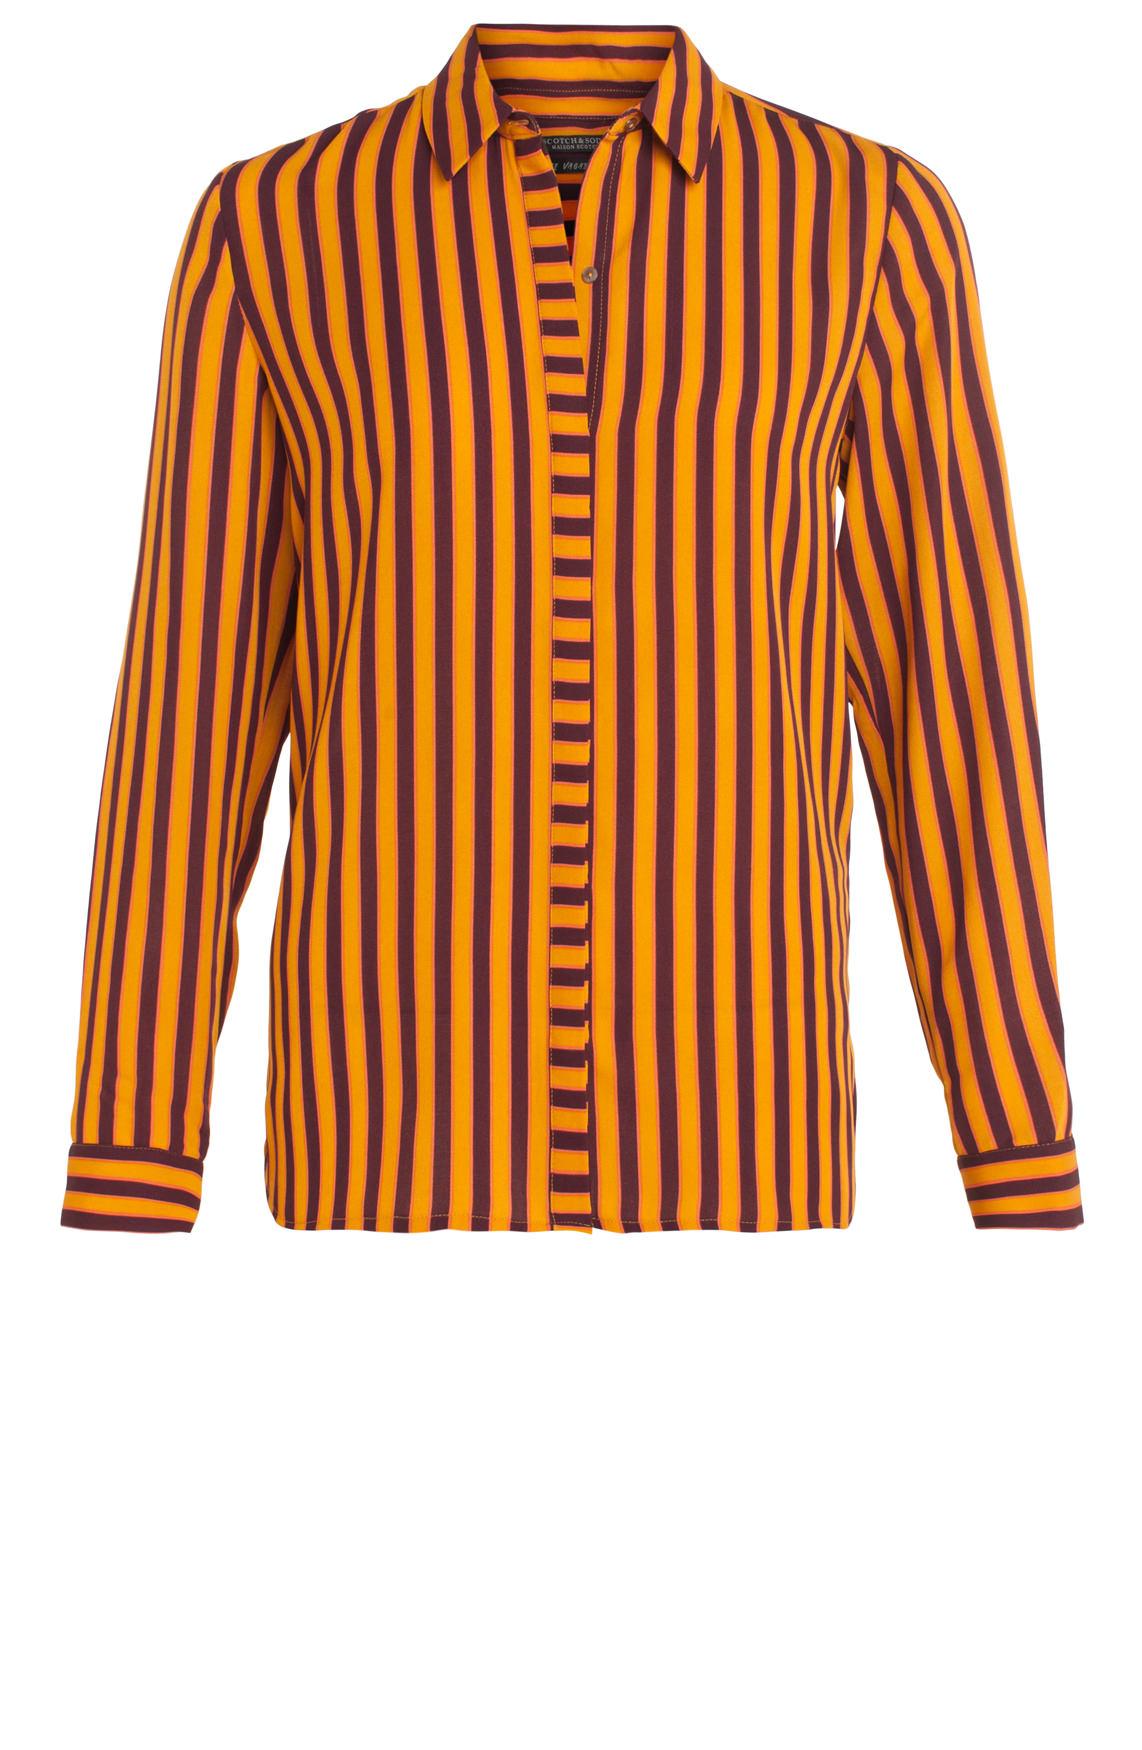 Maison Scotch Dames Gestreepte blouse Oranje